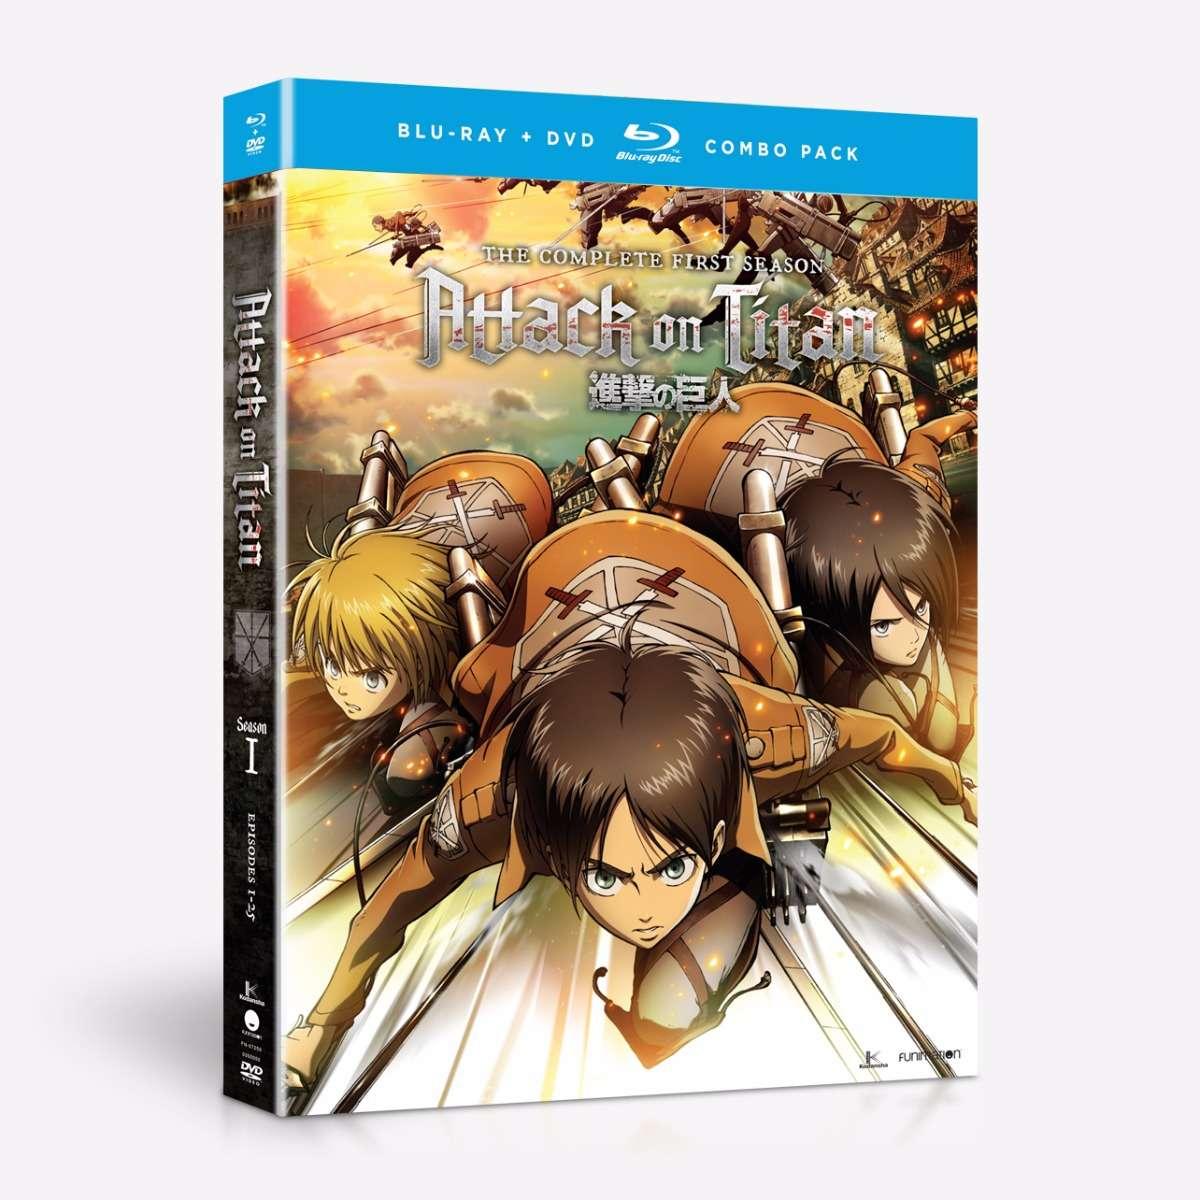 Complete Season One - BD/DVD Combo - FUN.com Exclusive home-video